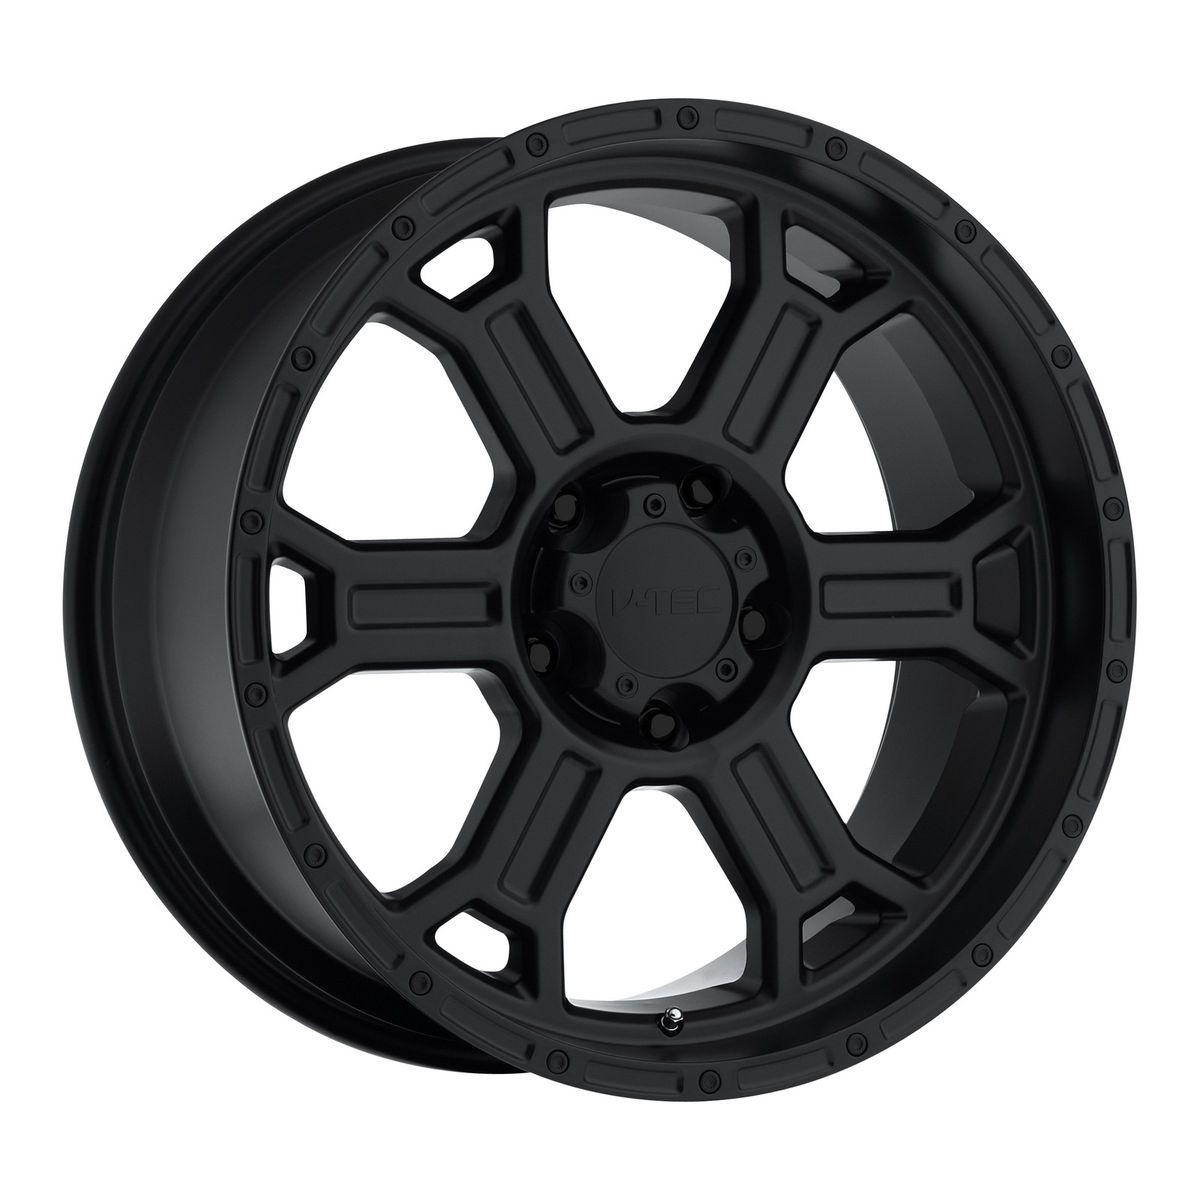 22 inch V Tec Raptor Matte Black Wheels Rims Ford F150